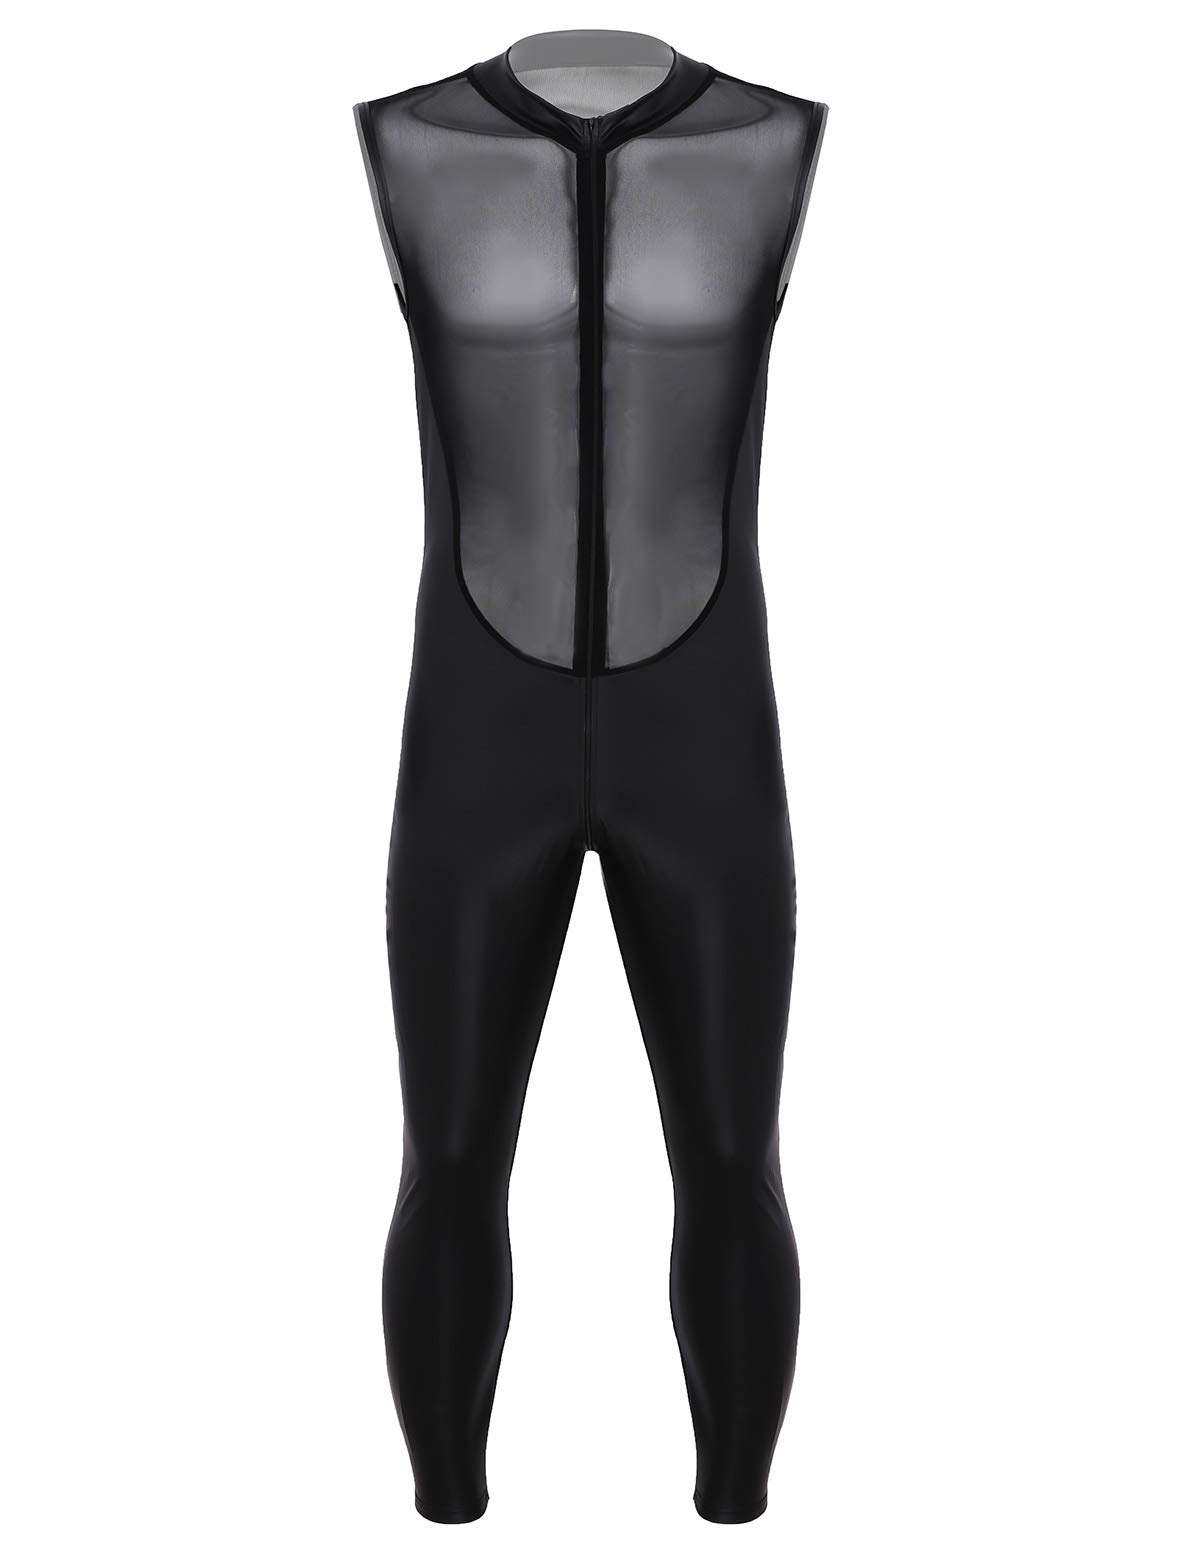 Agoky Mens Shiny Patent Leather Mesh Sheer Splice Tank Leotard Full Body Bodice Double Zipper Bodysuit Black Xx Large